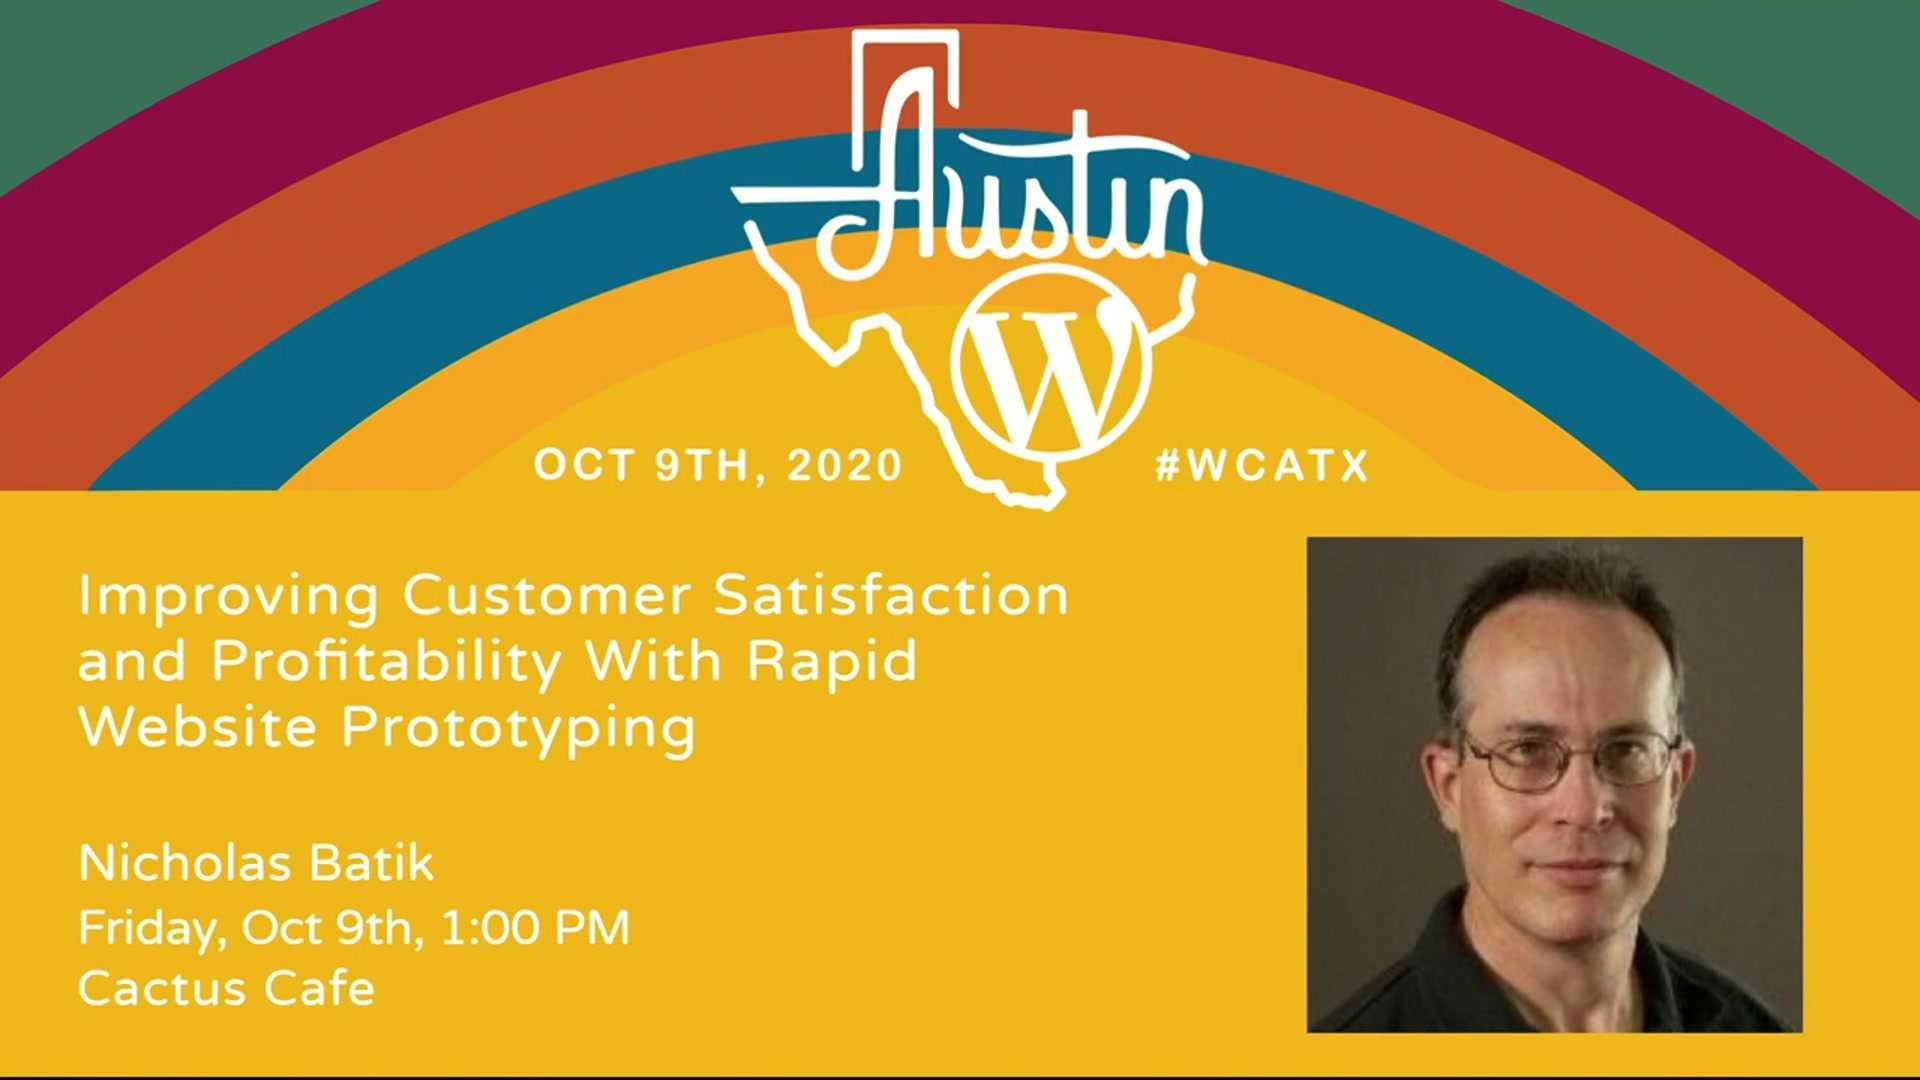 Nicholas Batik: Improving Customer Satisfaction and Profitability With Rapid Website Prototyping